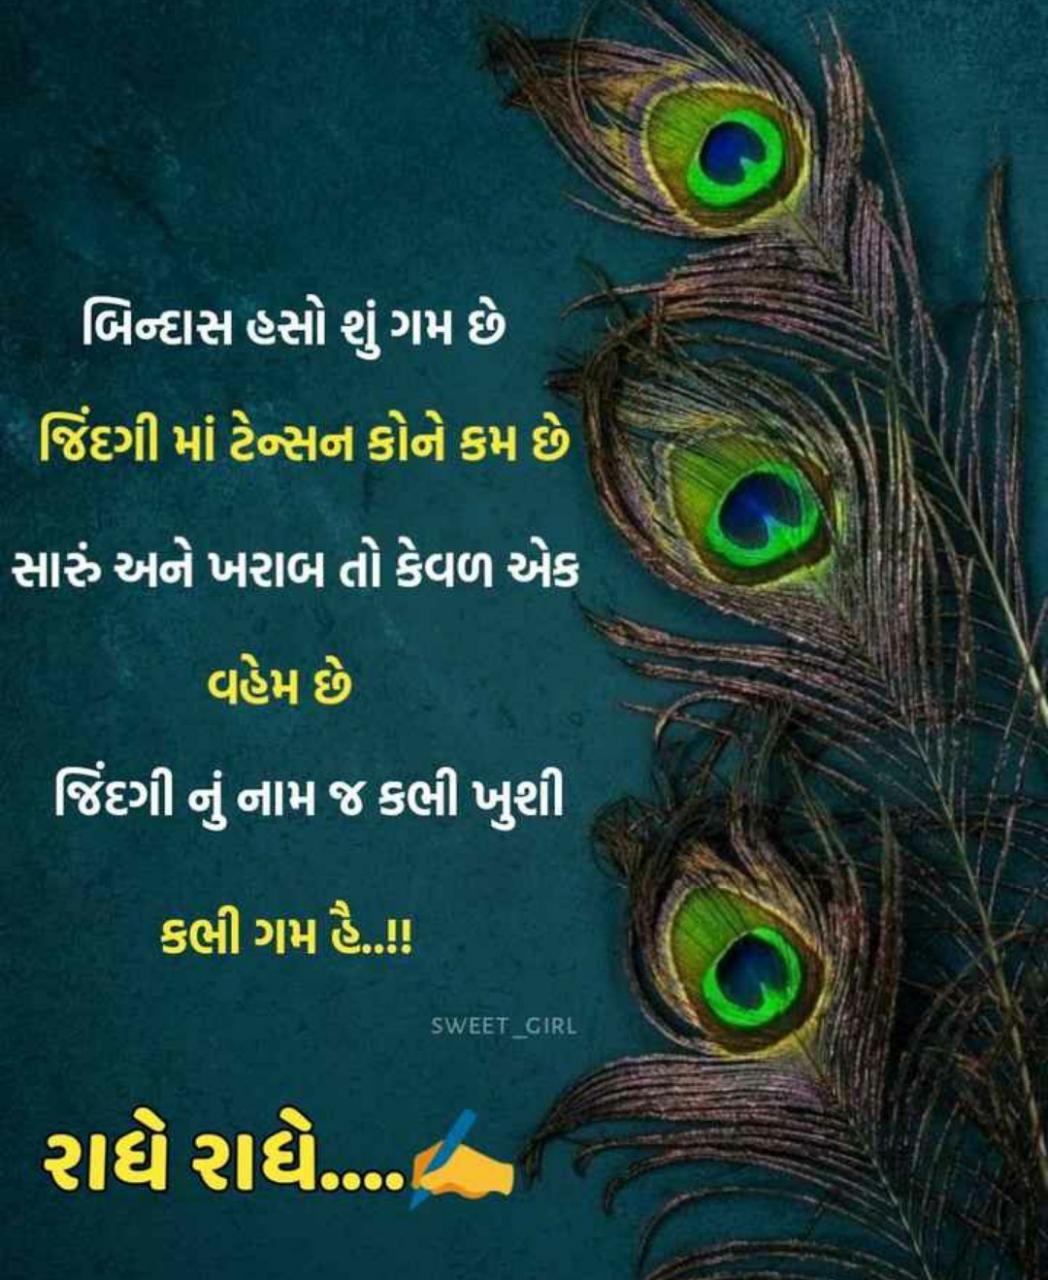 inspirational-quotes-gujarati-29.jpg